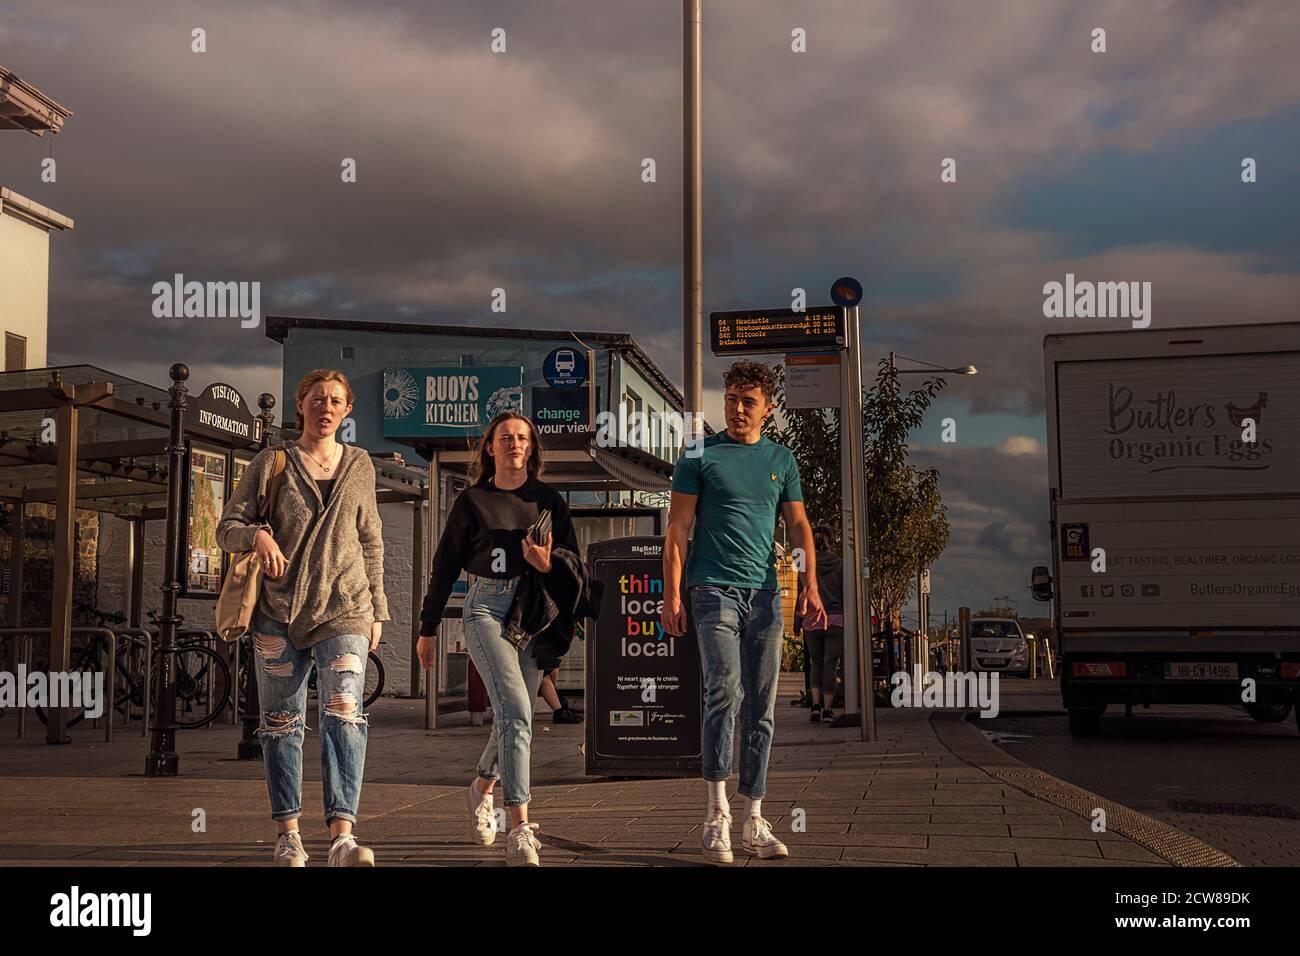 Everyday life. Girls and man walking towards the camera at Main street around train station. Greystones. Ireland. Stock Photo